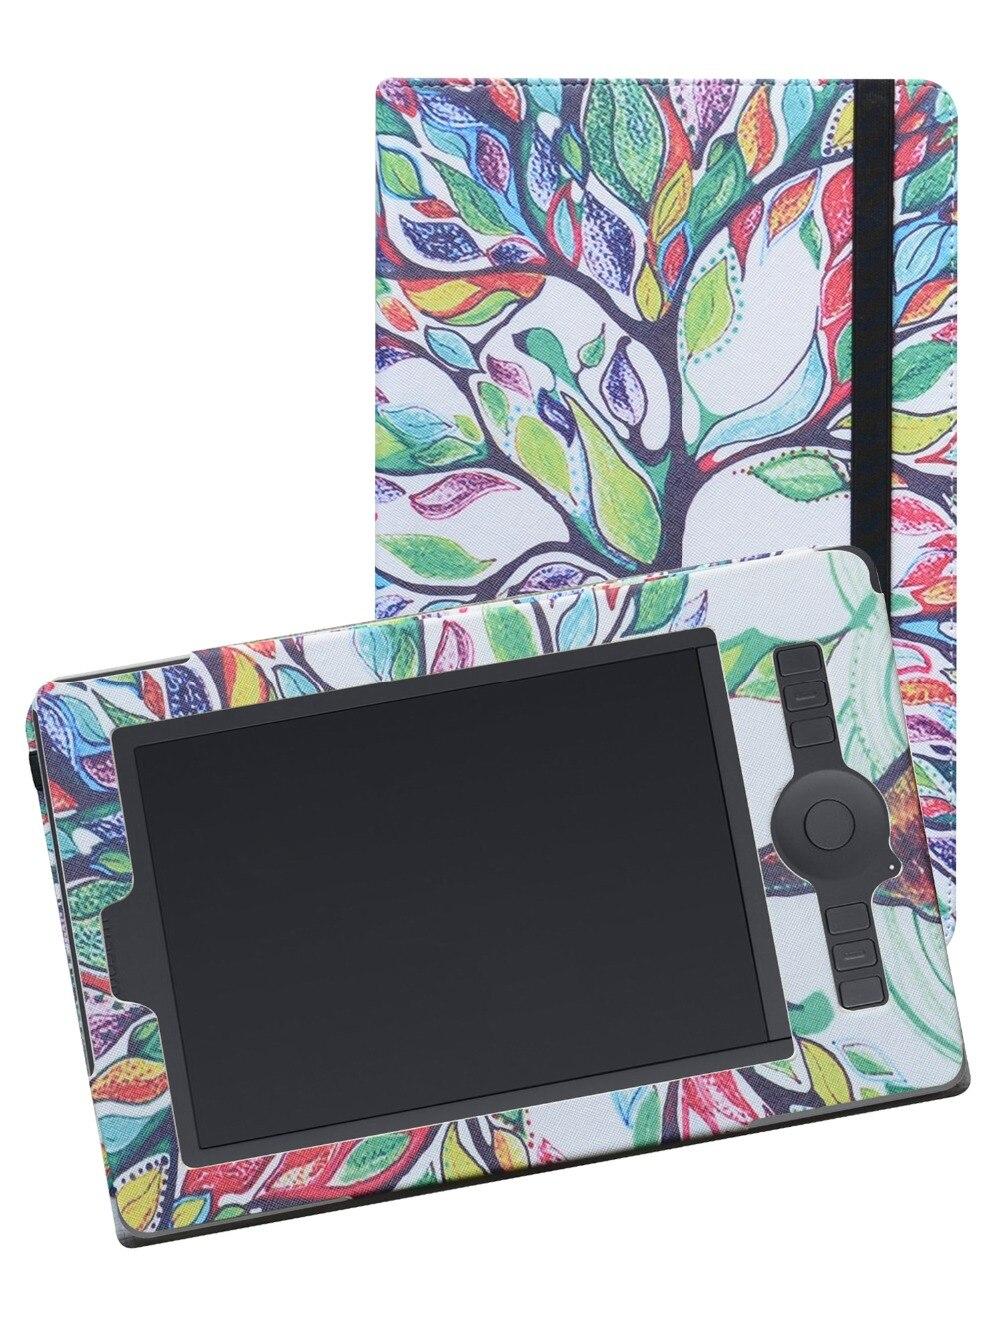 2016 New PU Leather Stand Cover Magnetic Case For Wacom Intuos Pro PTH651 Drawing Board Protective Sleeve графические планшеты wacom планшет для рисования wacom intuos pro s pth 451 rupl usb